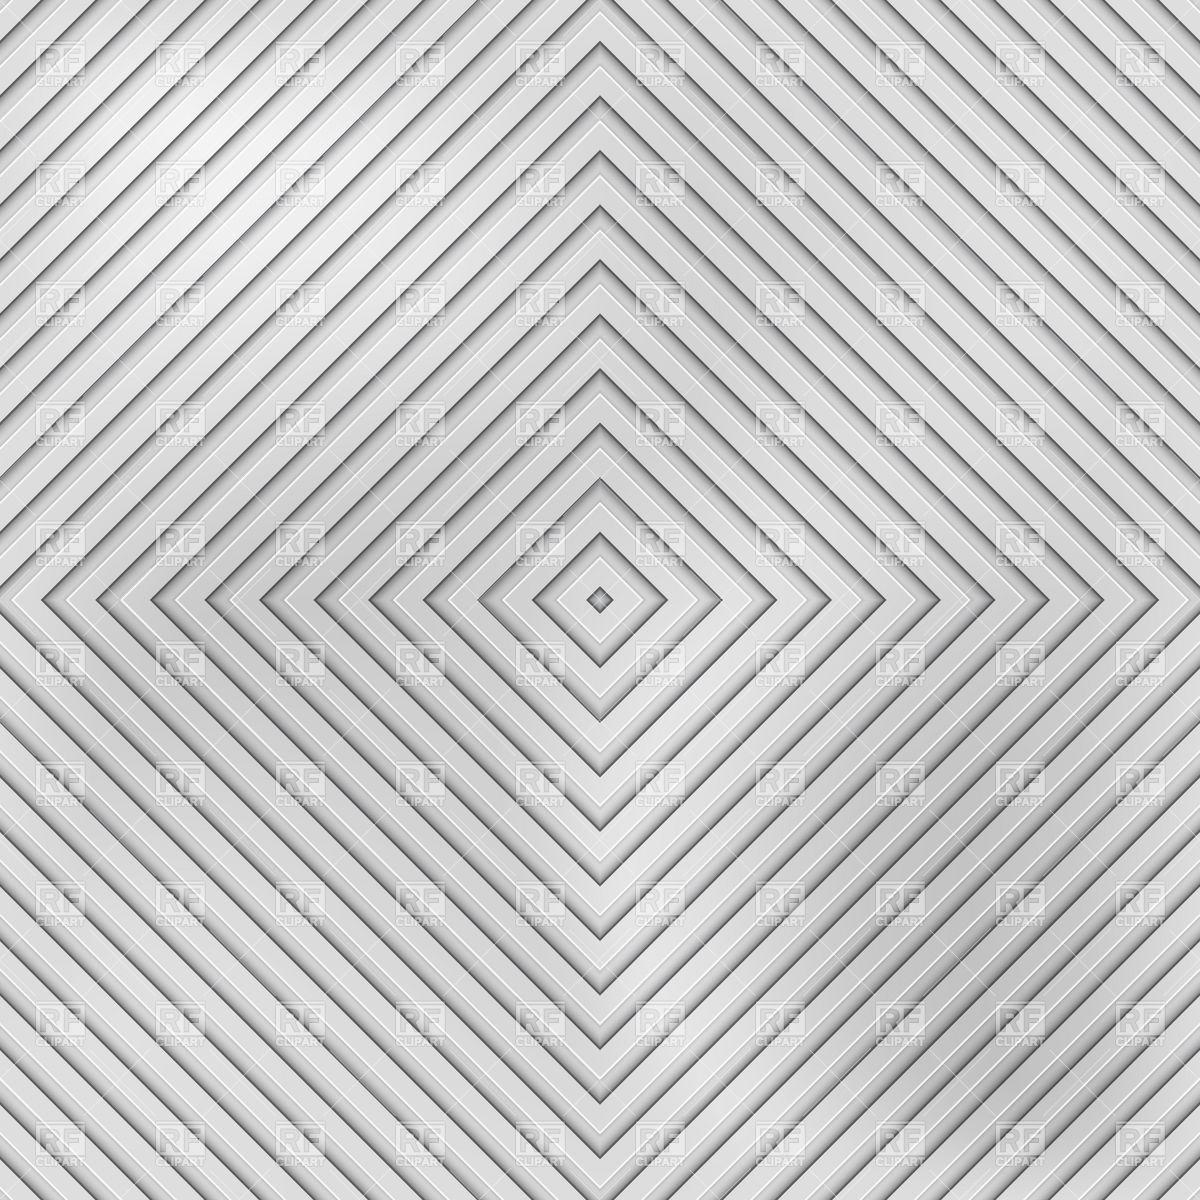 Grooved square herringbone metallic background Vector Image #9319.